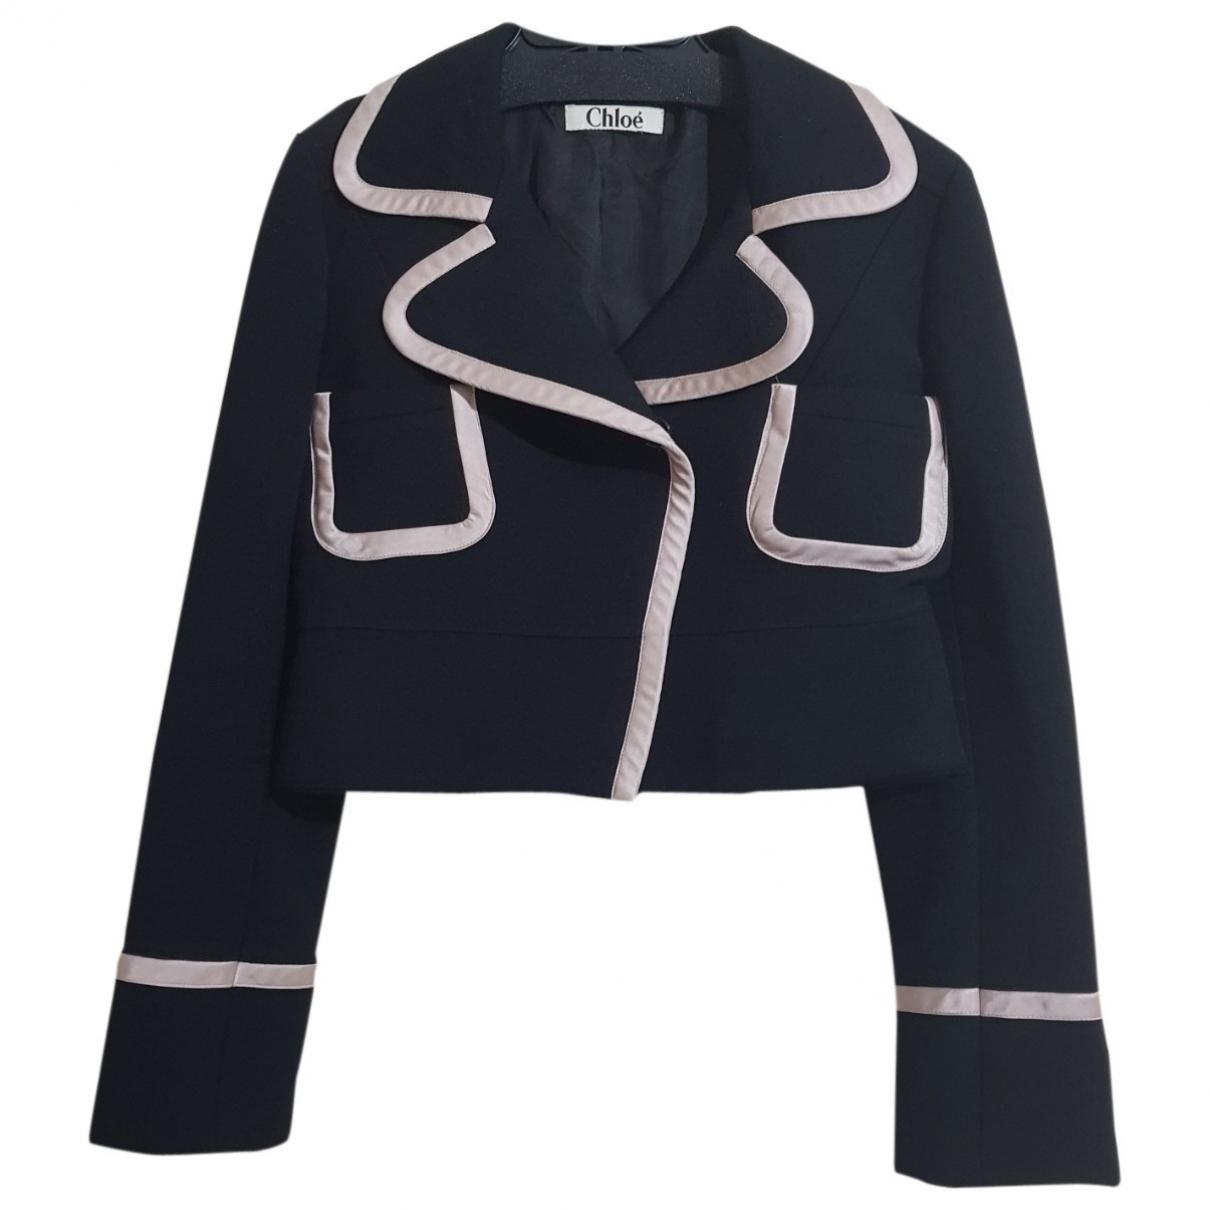 Chloé \N Black Wool jacket for Women XS International